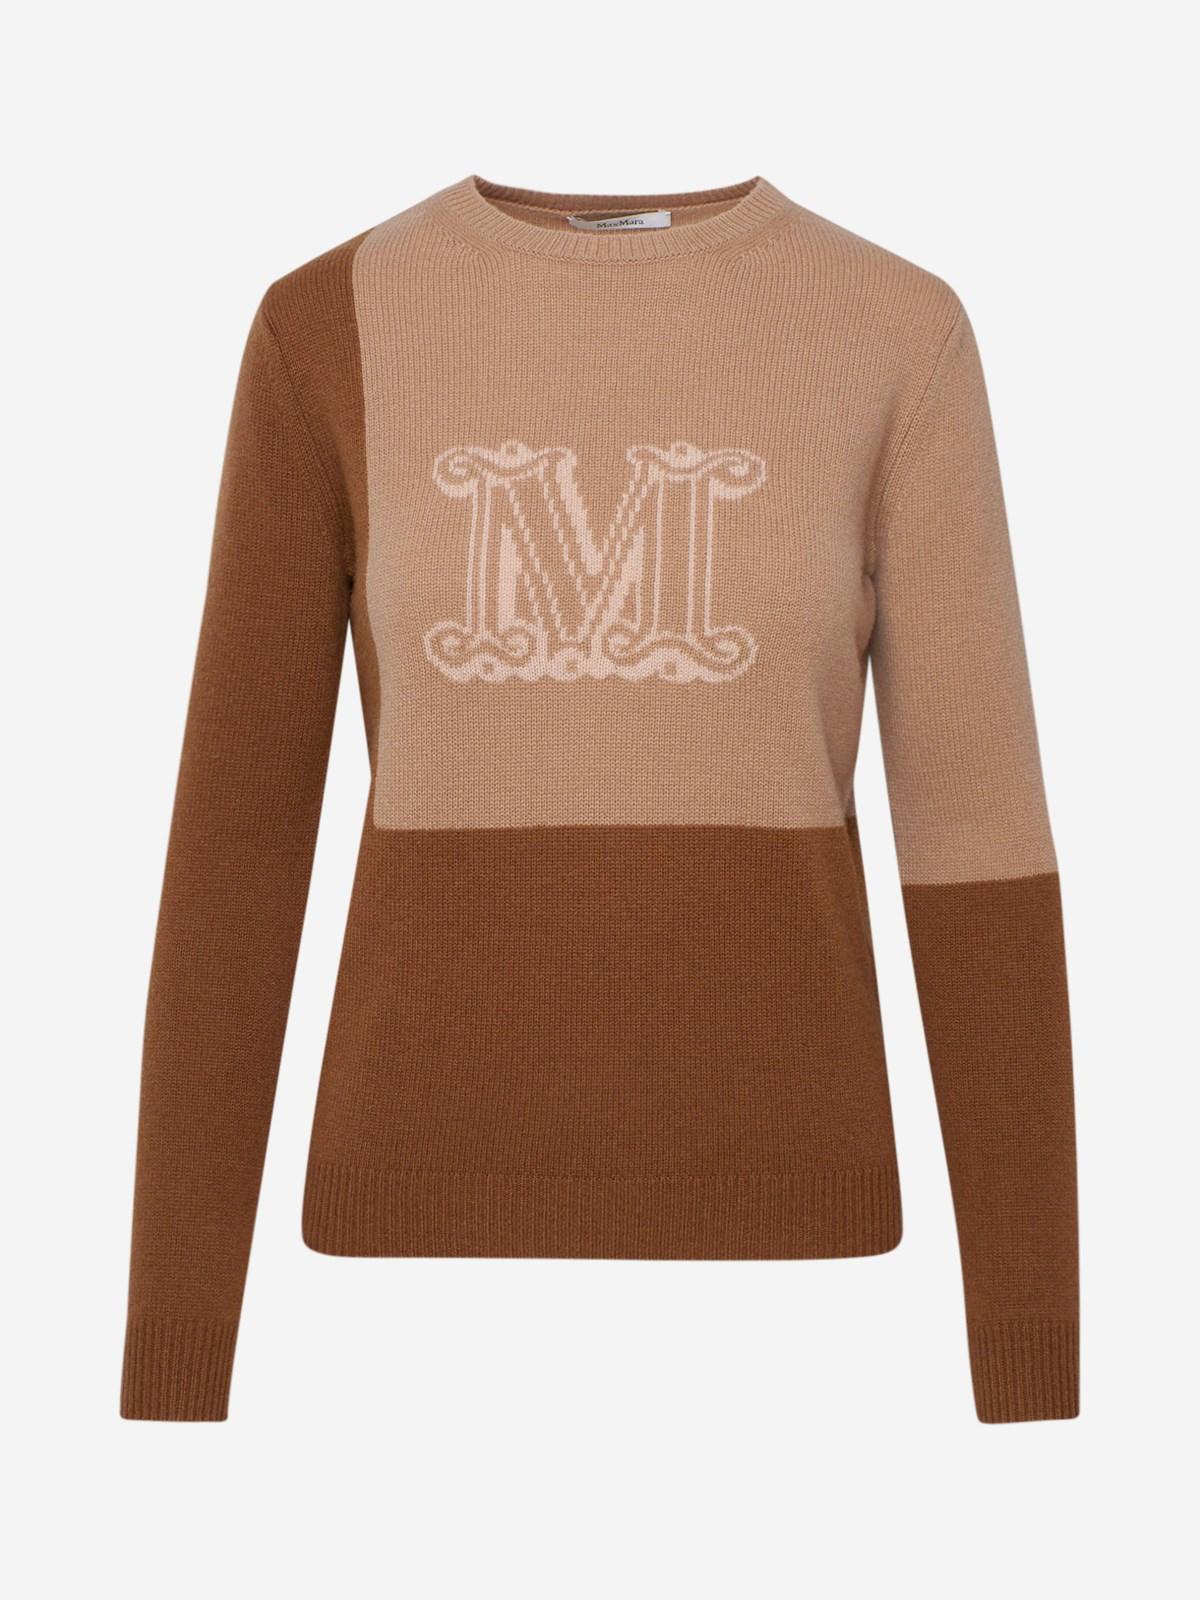 Max Mara Sweaters BROWN CAIMANO SWEATER